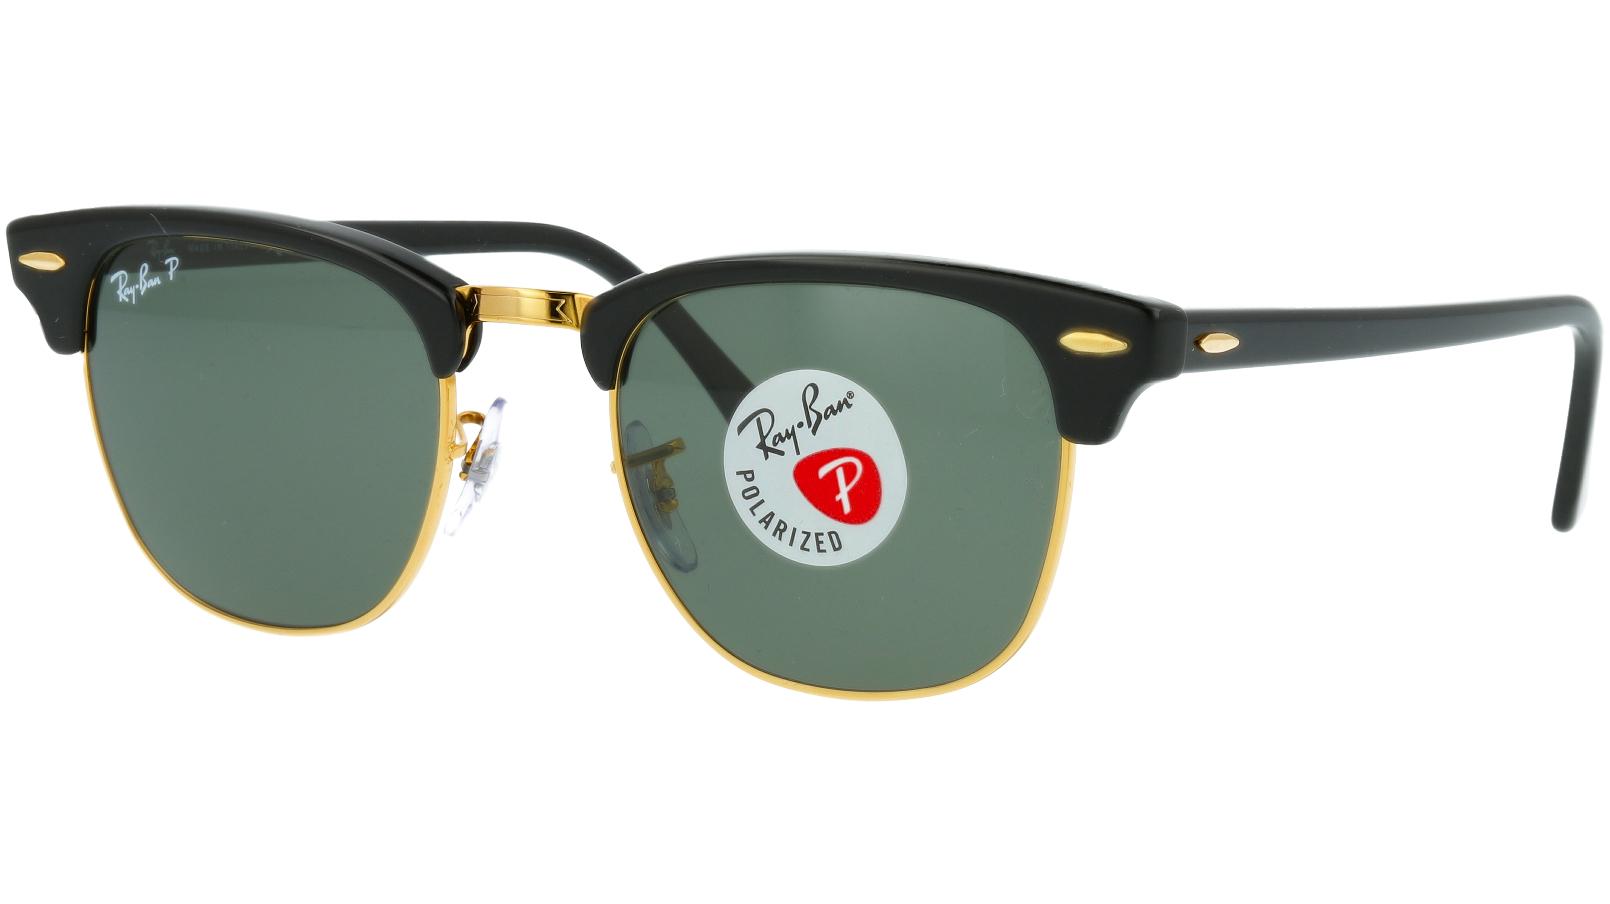 Ray-Ban RB3016 901/58 49 BLACK Polarised Sunglasses